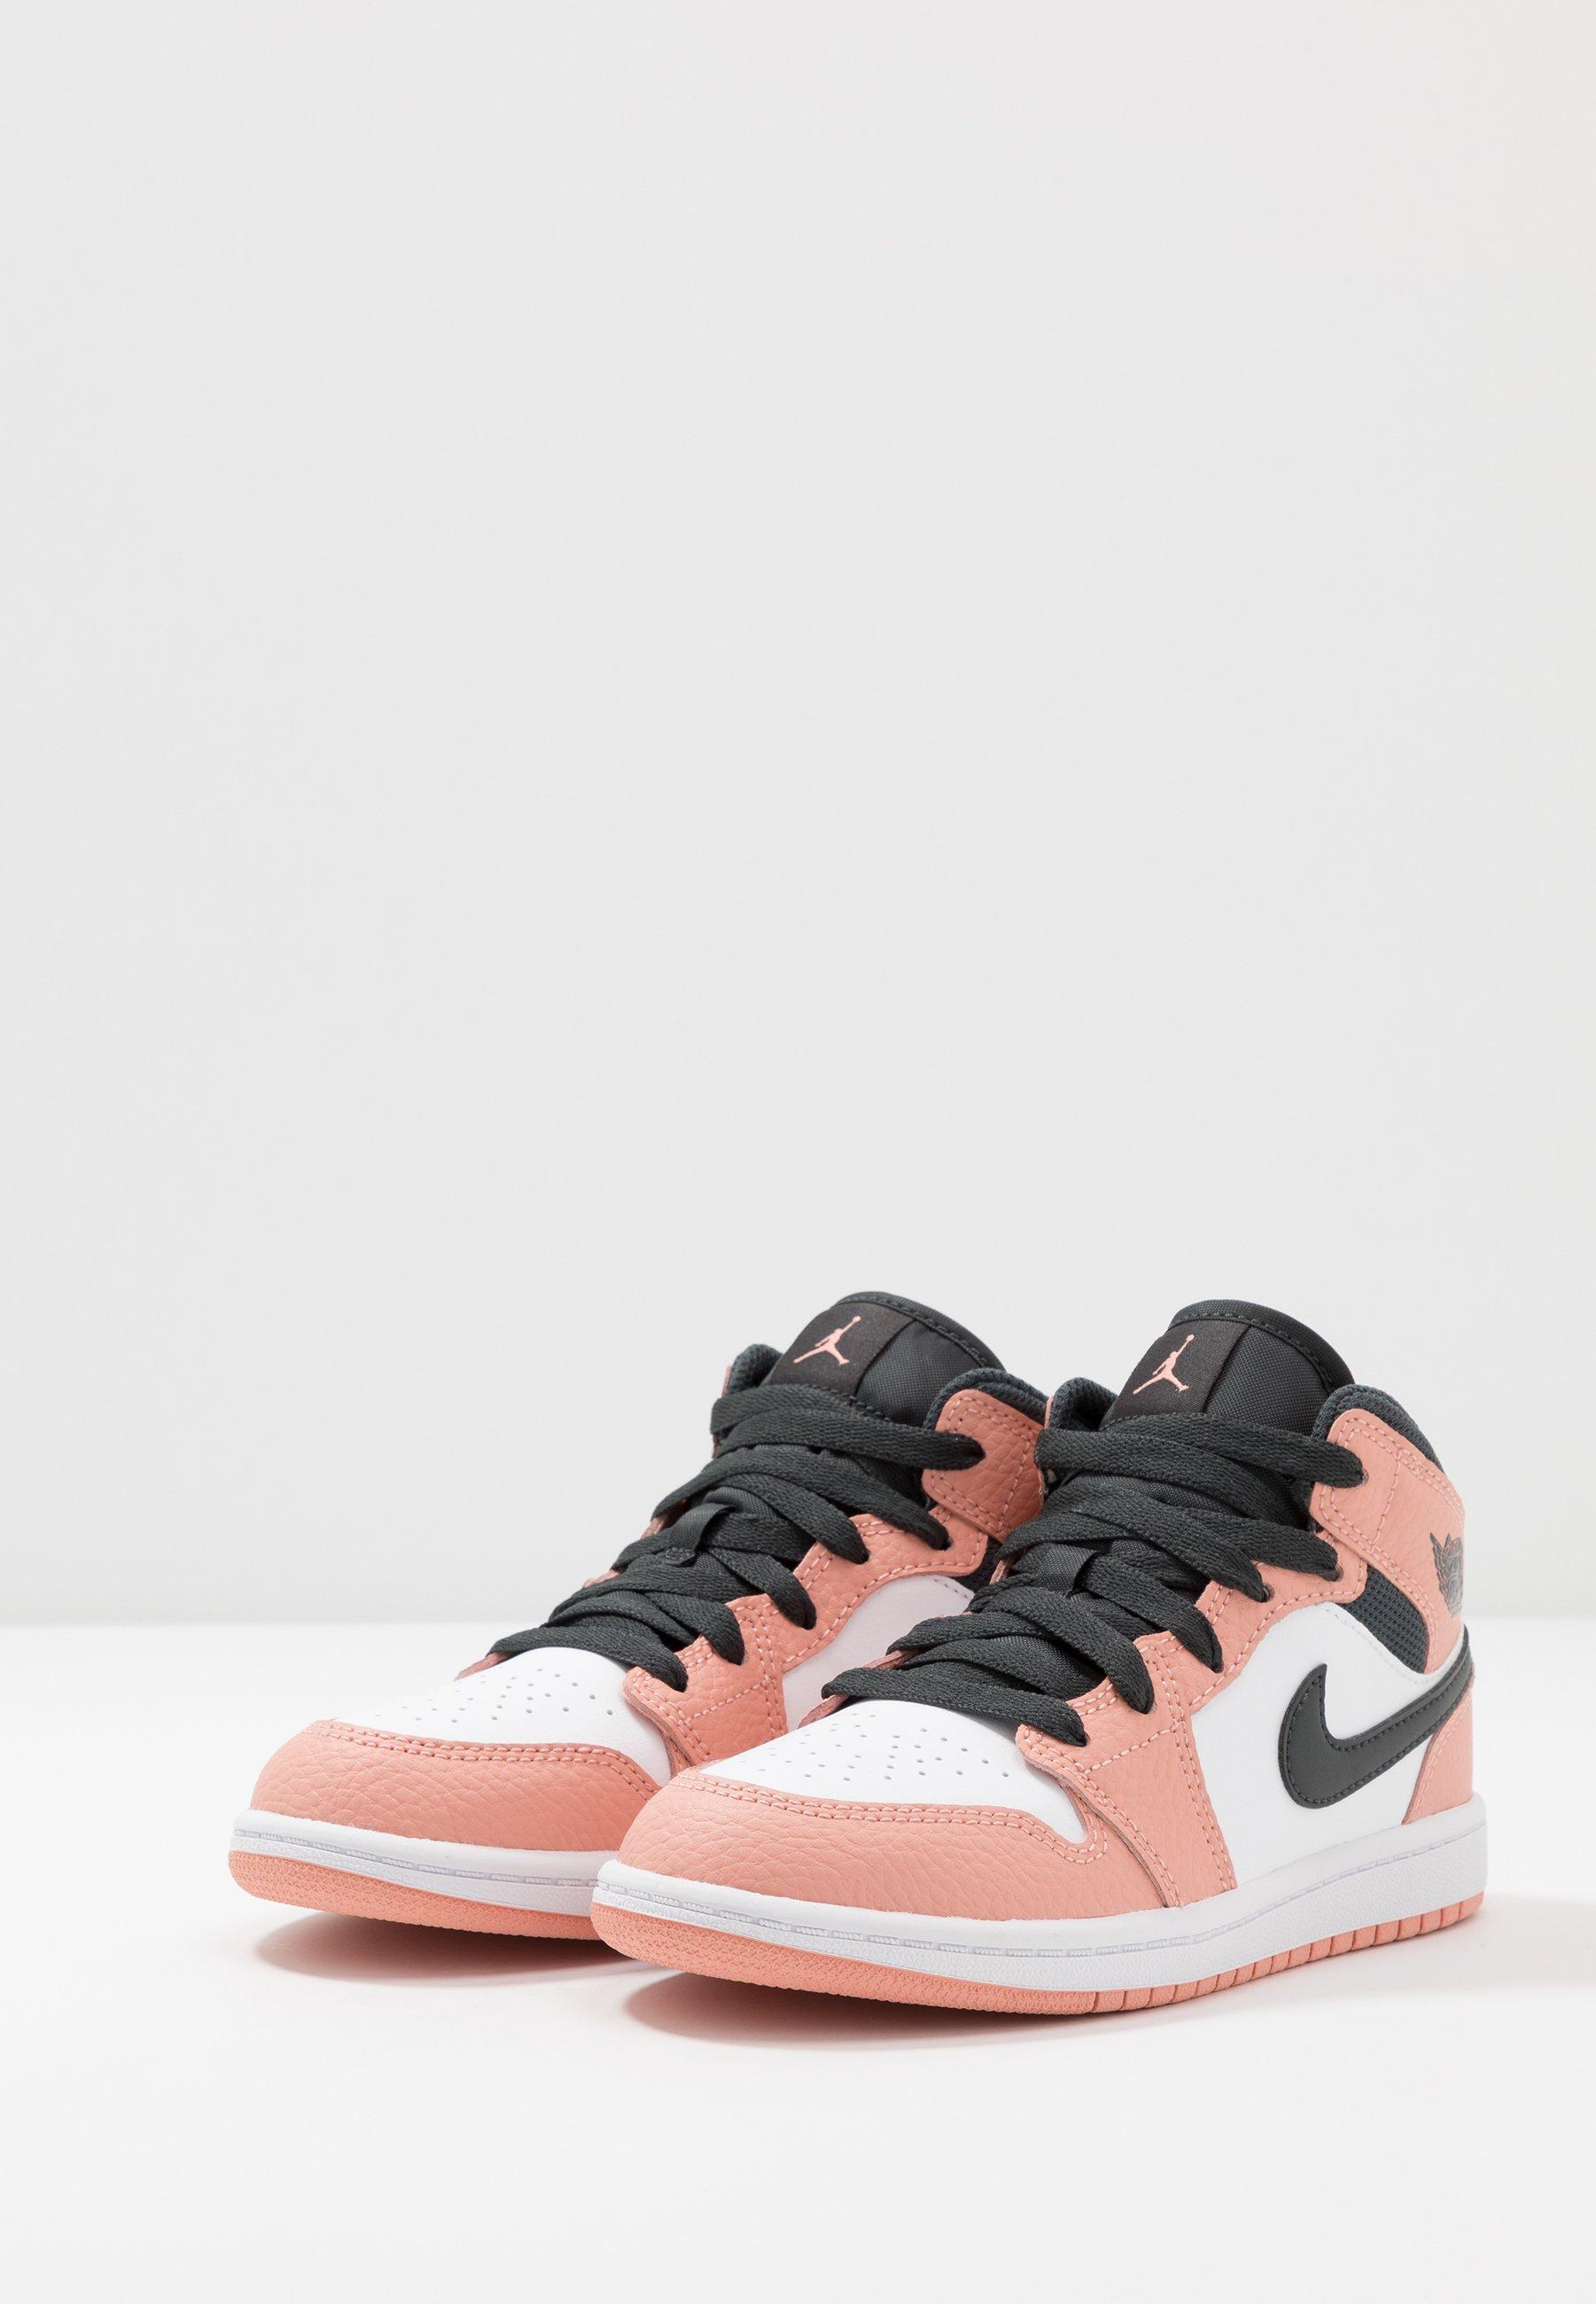 Jordan 1 MID - Chaussures de basket - pink quartz/dark smoke grey ...